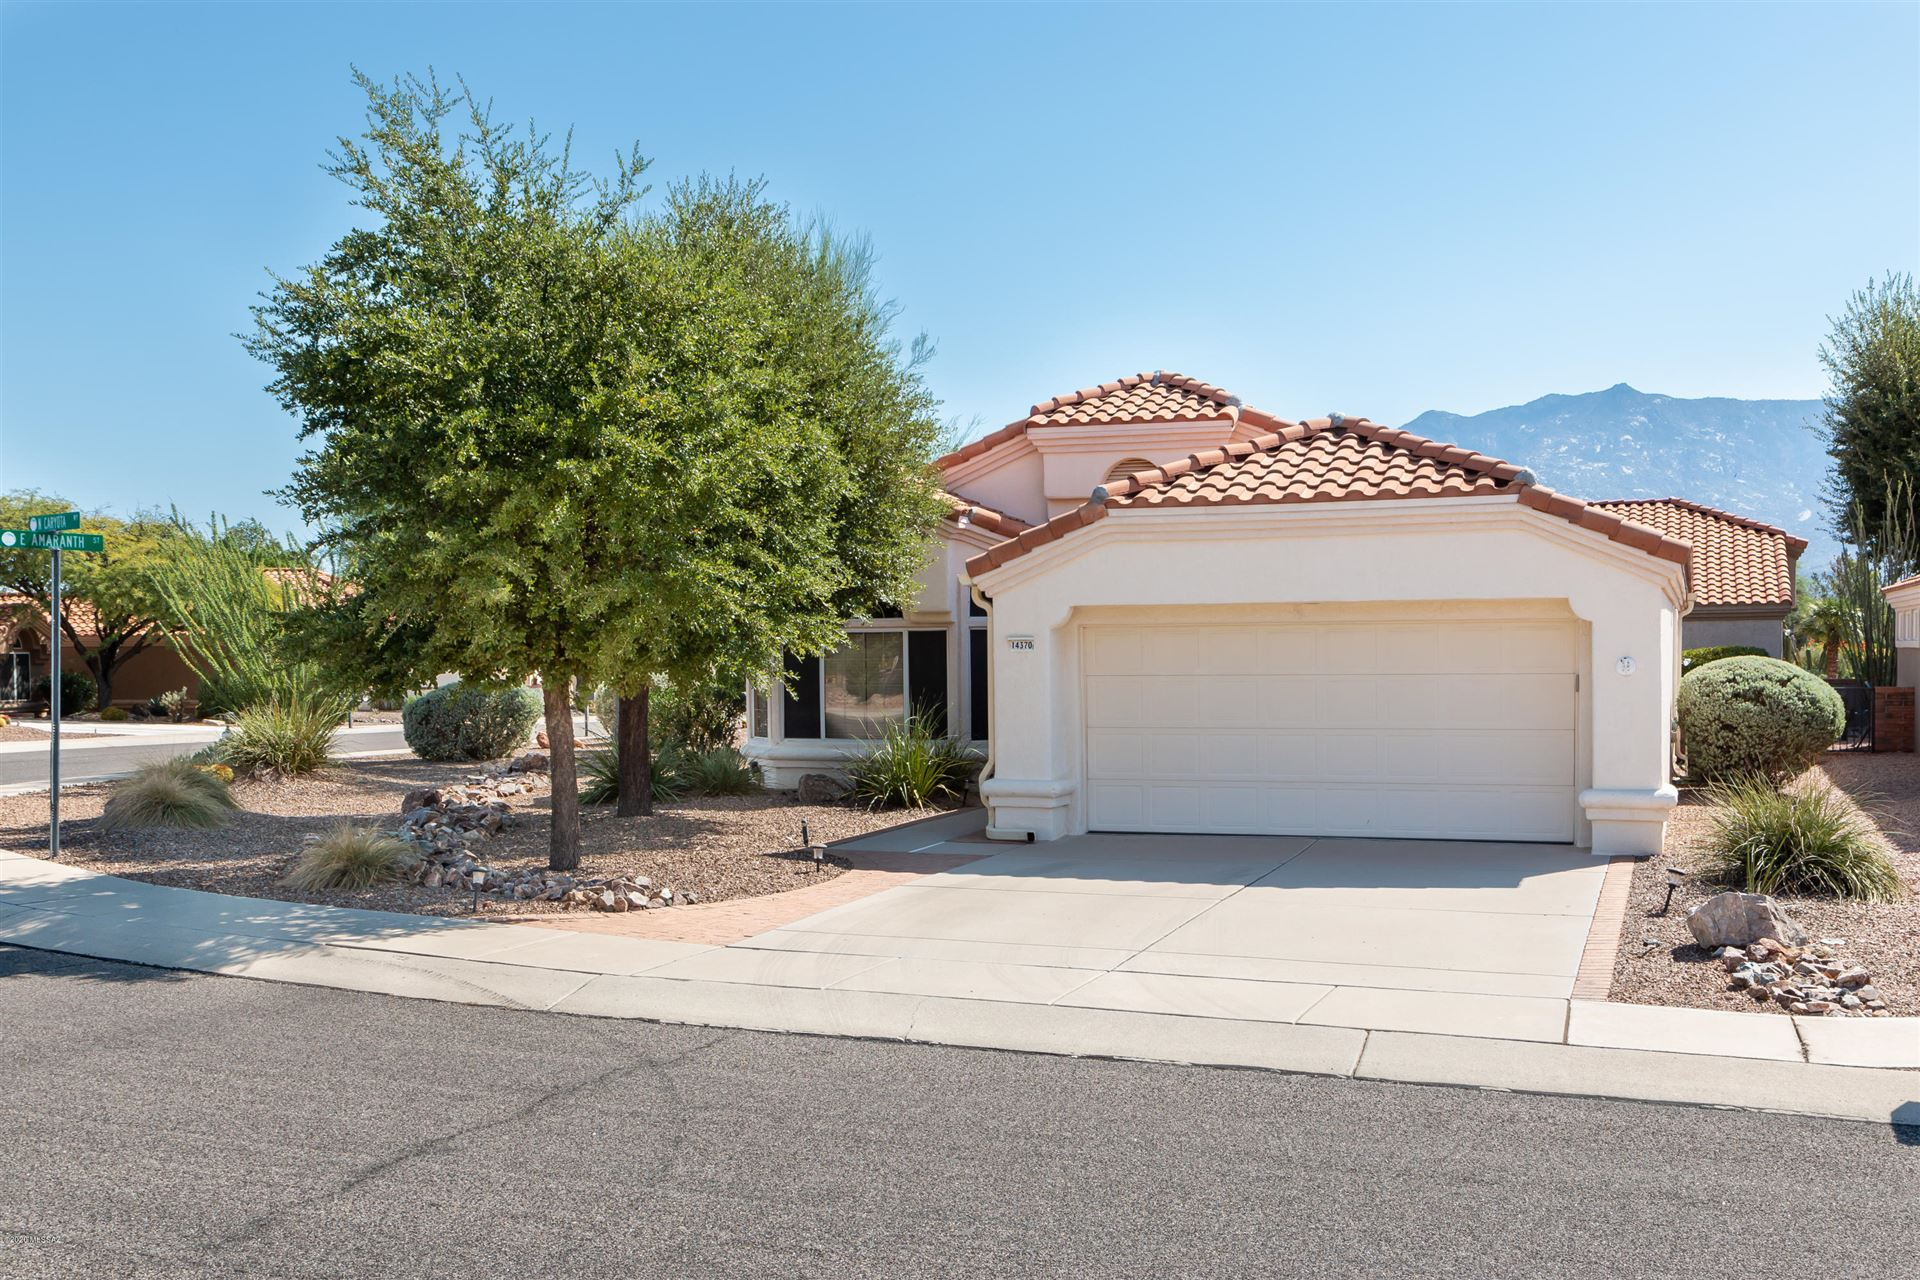 14370 N Caryota Way, Oro Valley, AZ 85755 - MLS#: 22022308